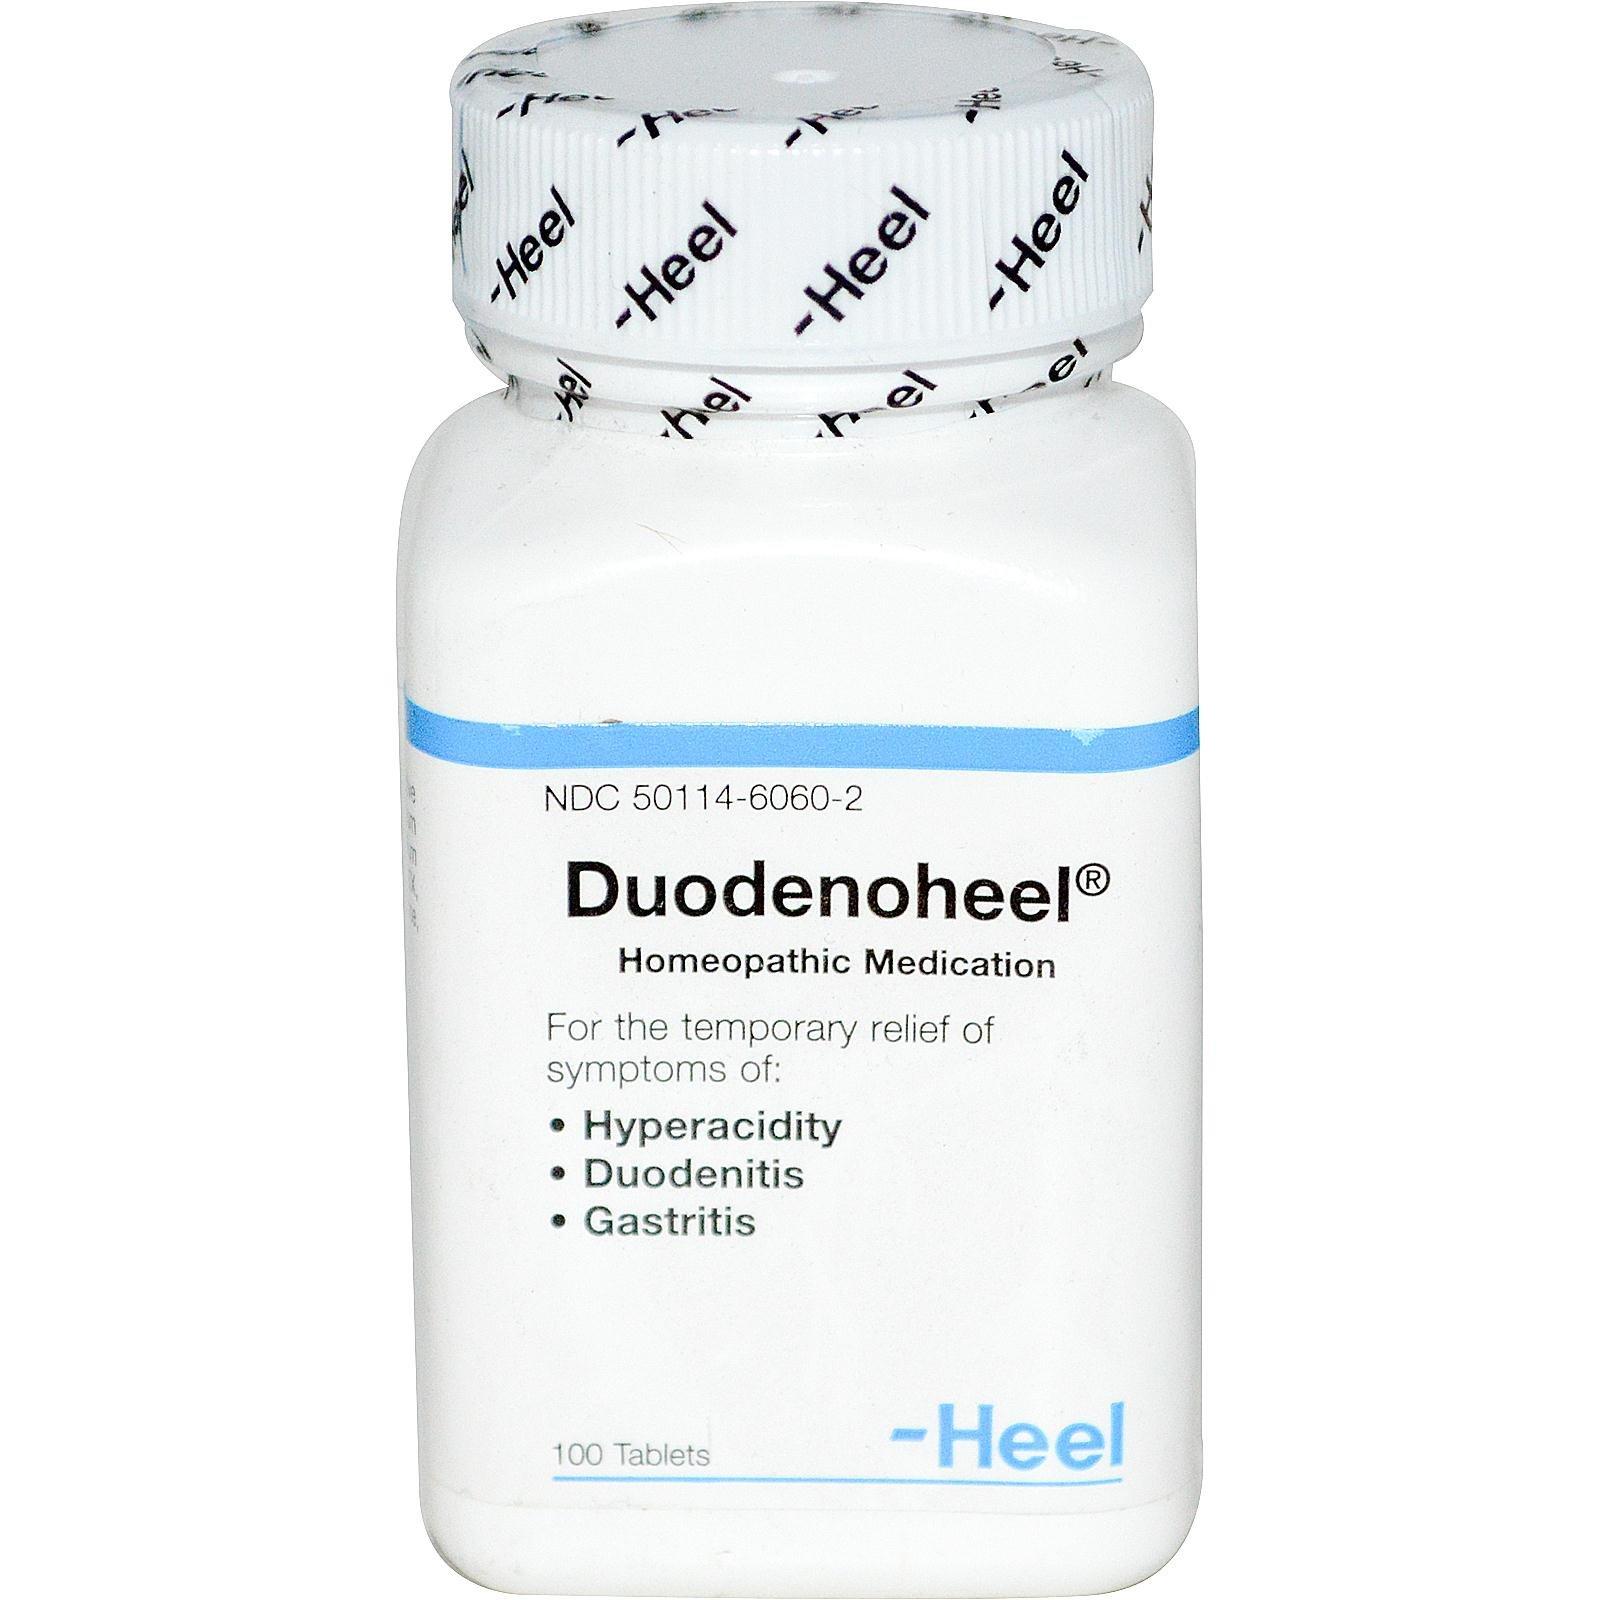 Duodenoheel 100 tablets by Heel